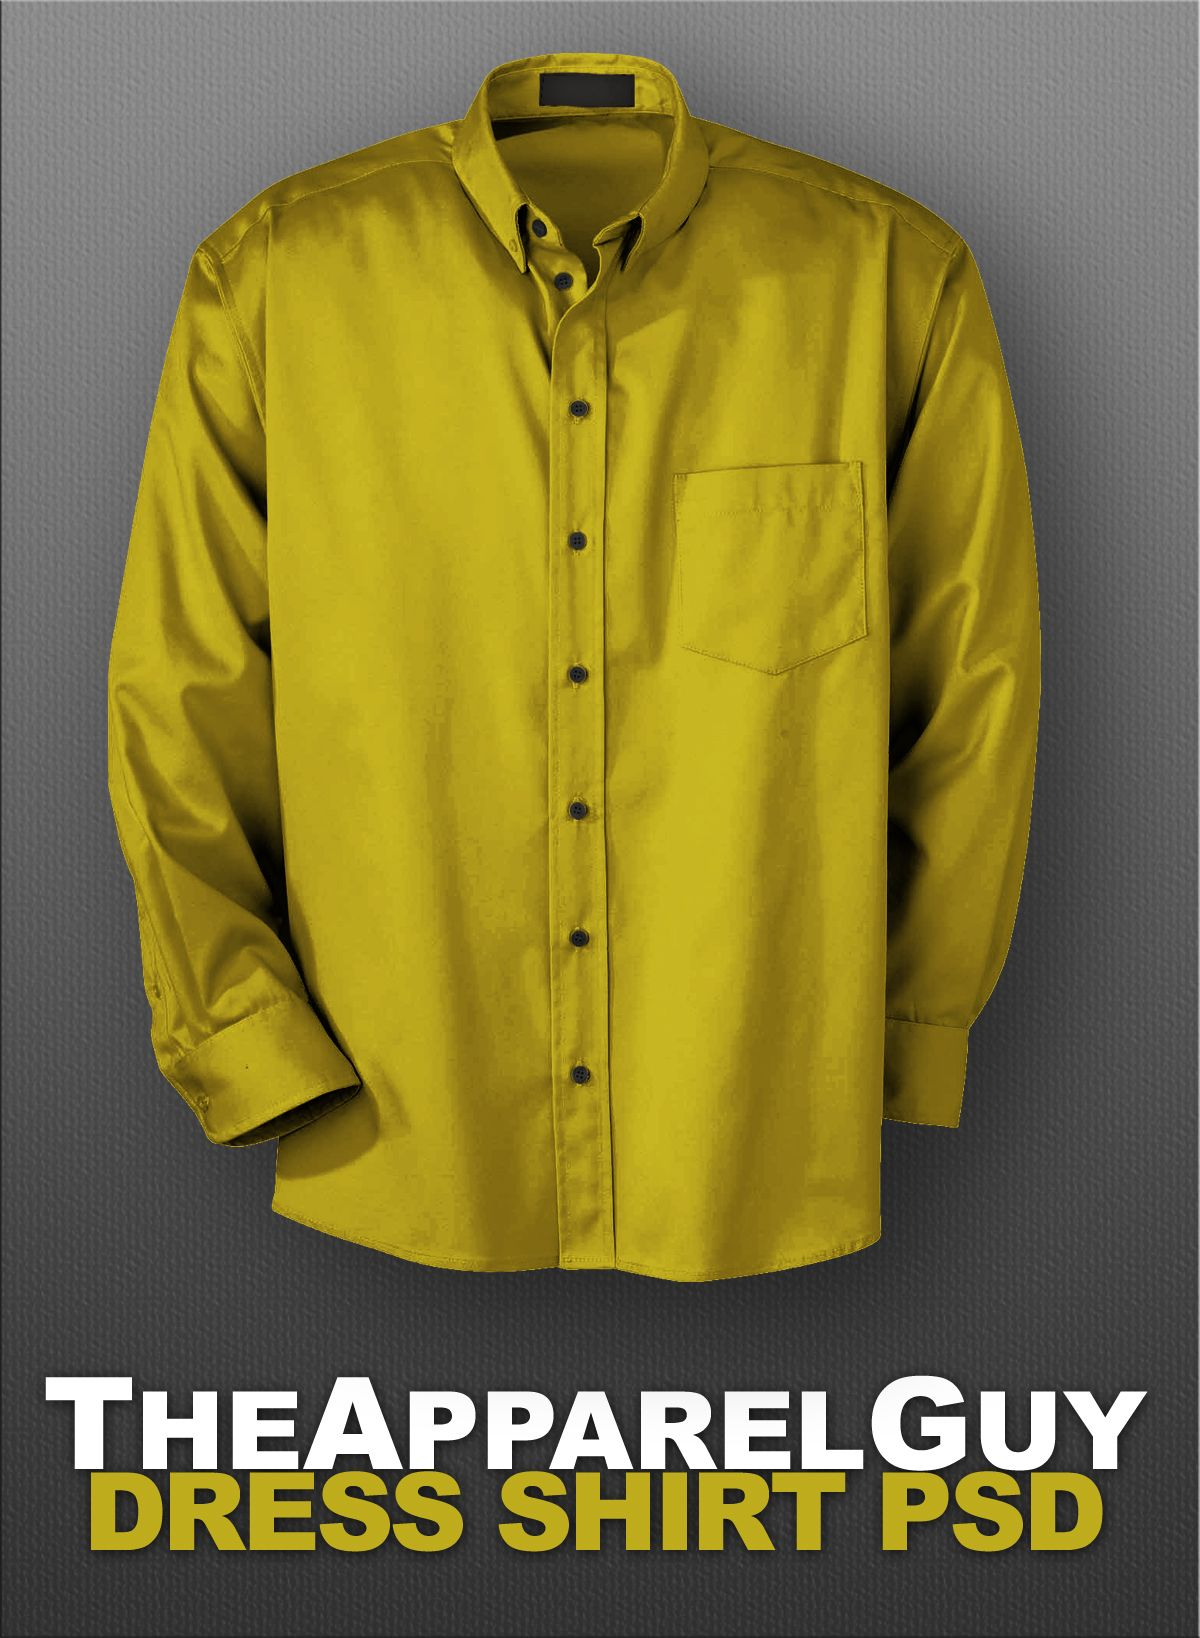 Download Dress Shirt Psd Shirts Shirt Dress Clothing Templates